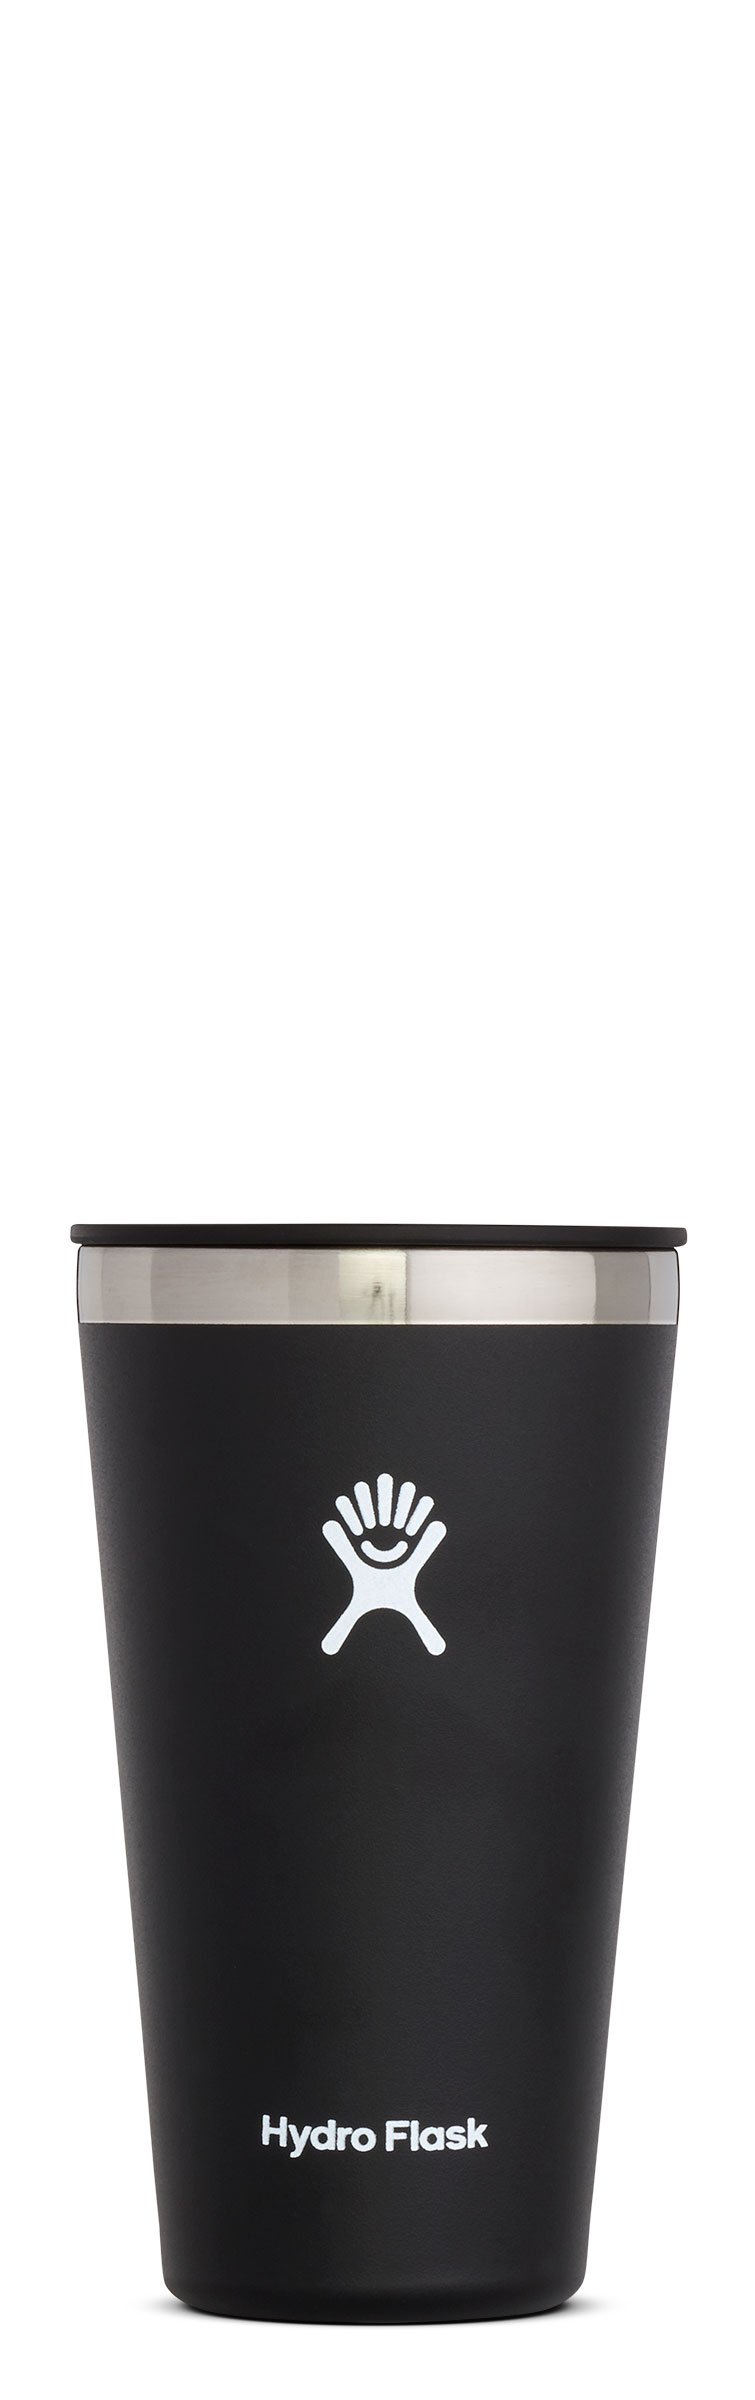 Hydro Flask 16 oz Tumbler Black